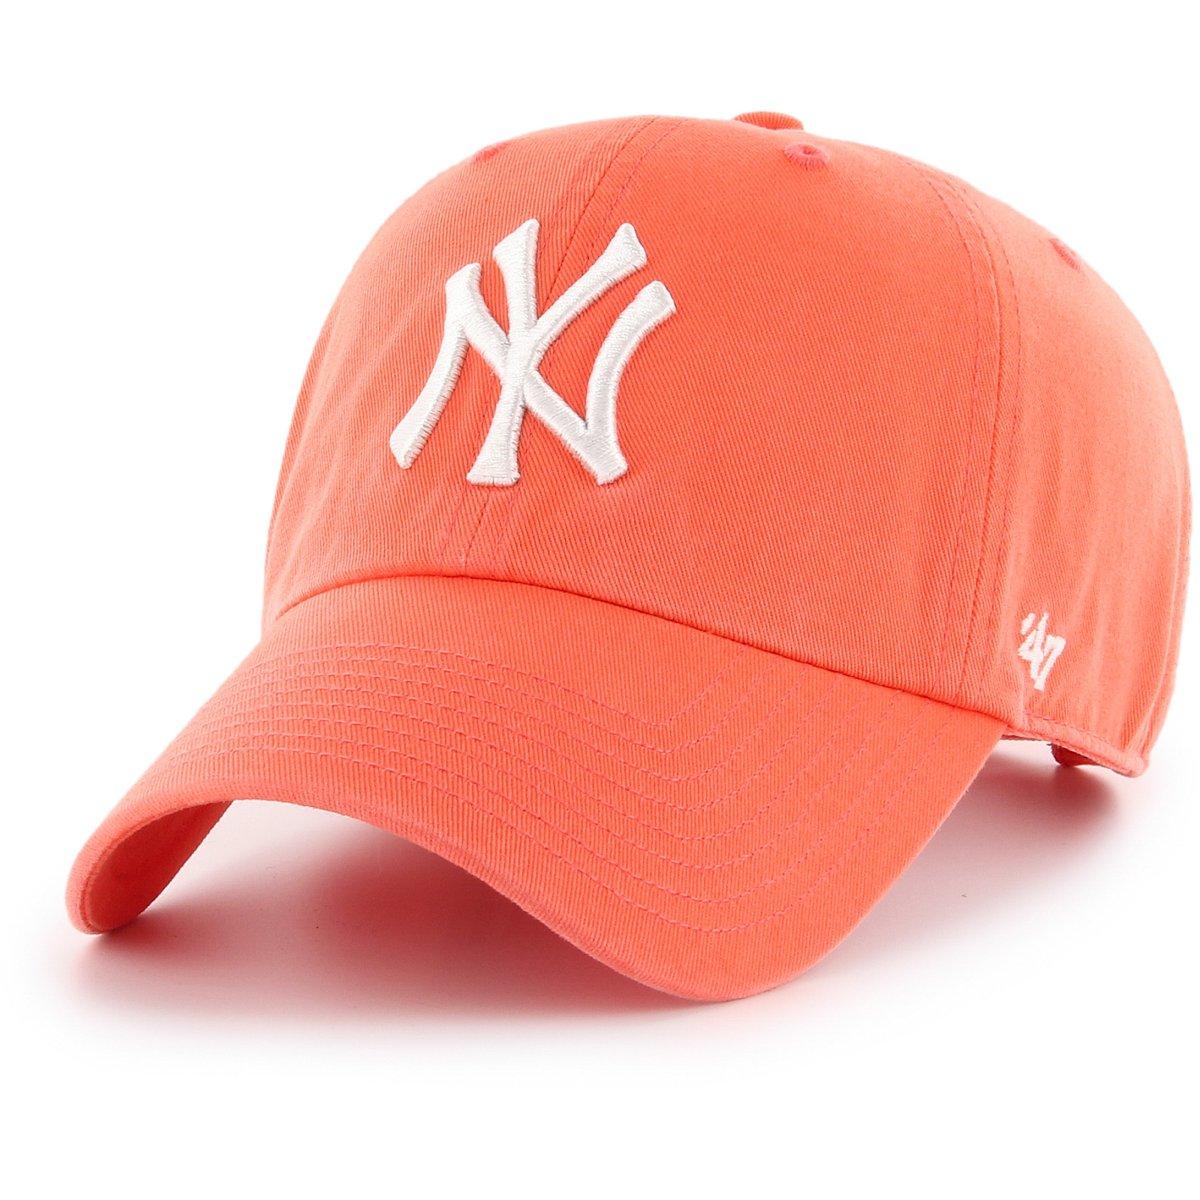 1d18b7a9b66cb 47 Brand Adjustable Cap - CLEAN UP New York Yankees grape ...